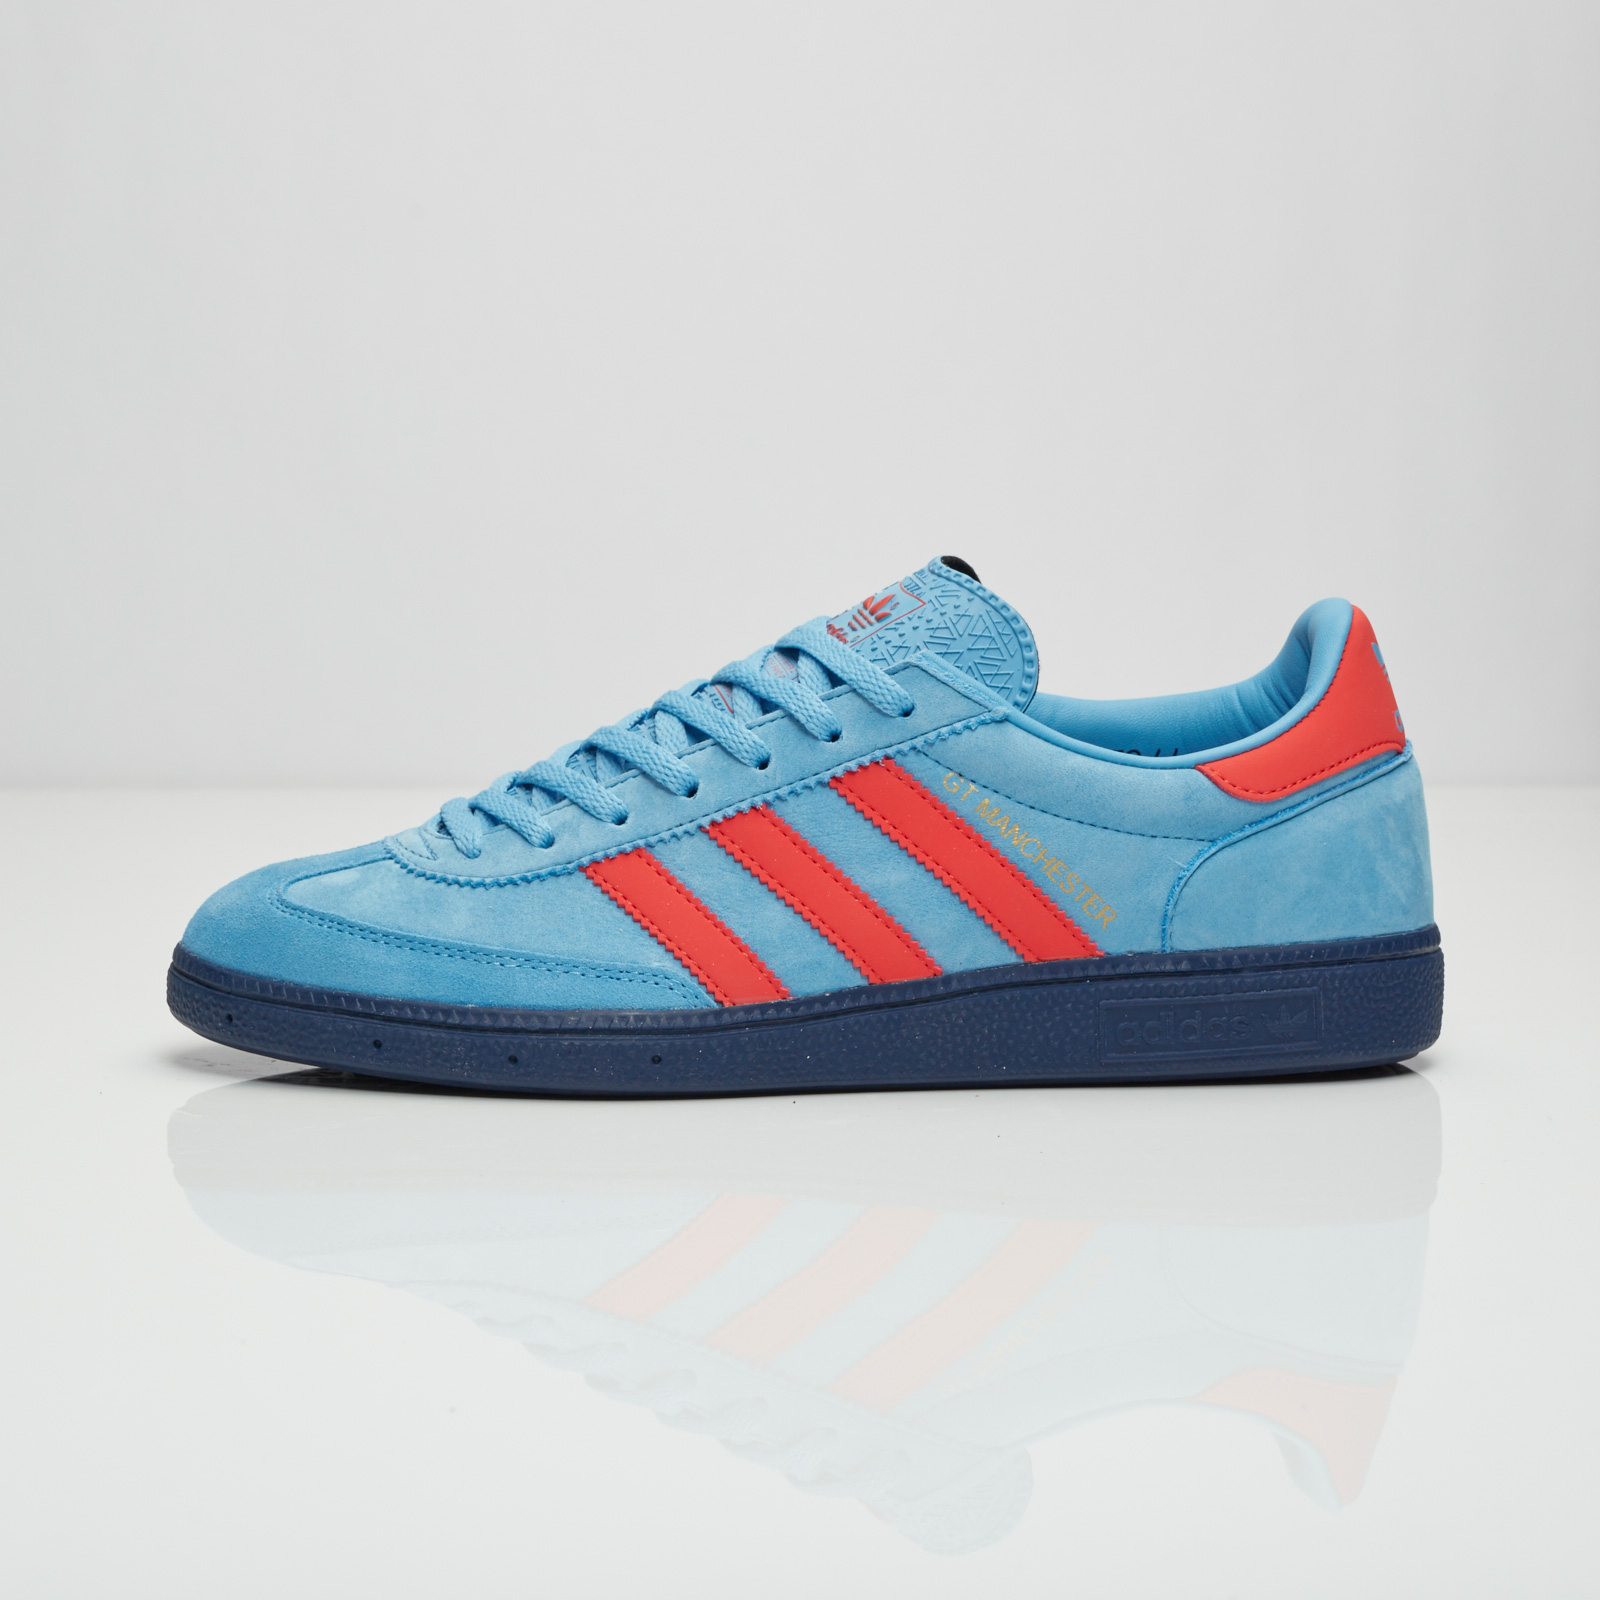 quality design 739fd e8572 adidas GT Manchester SPZL - S80567 - Sneakersnstuff   sneakers   streetwear  online since 1999